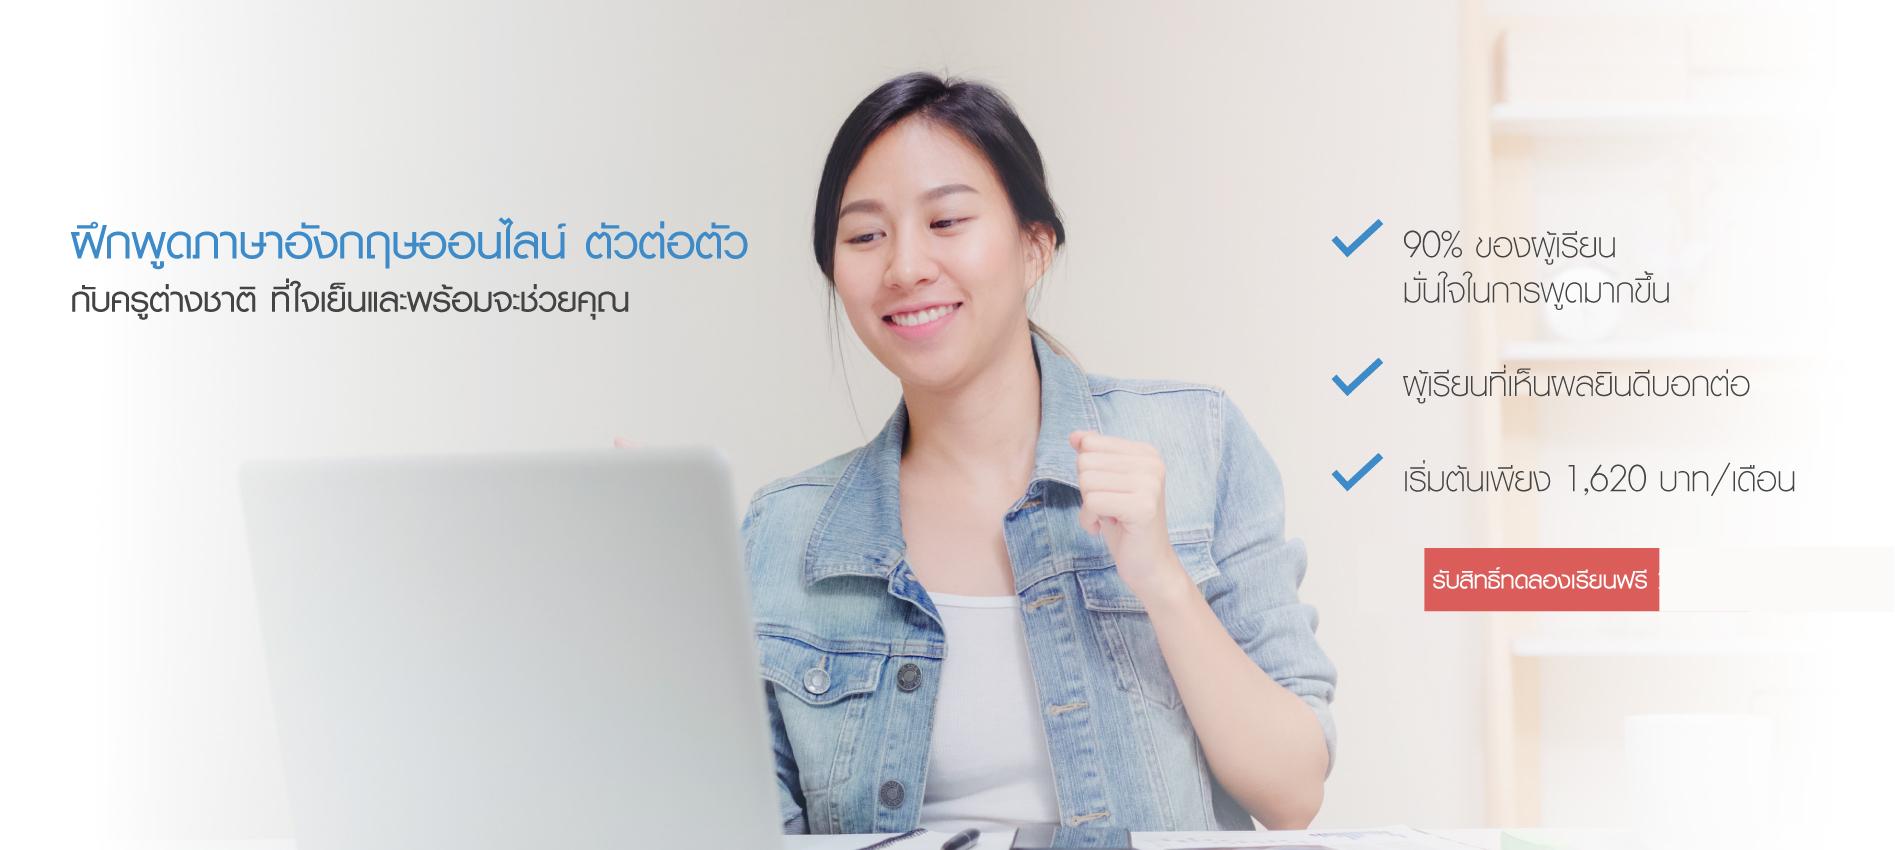 Thailand_size_engoo_banner_1